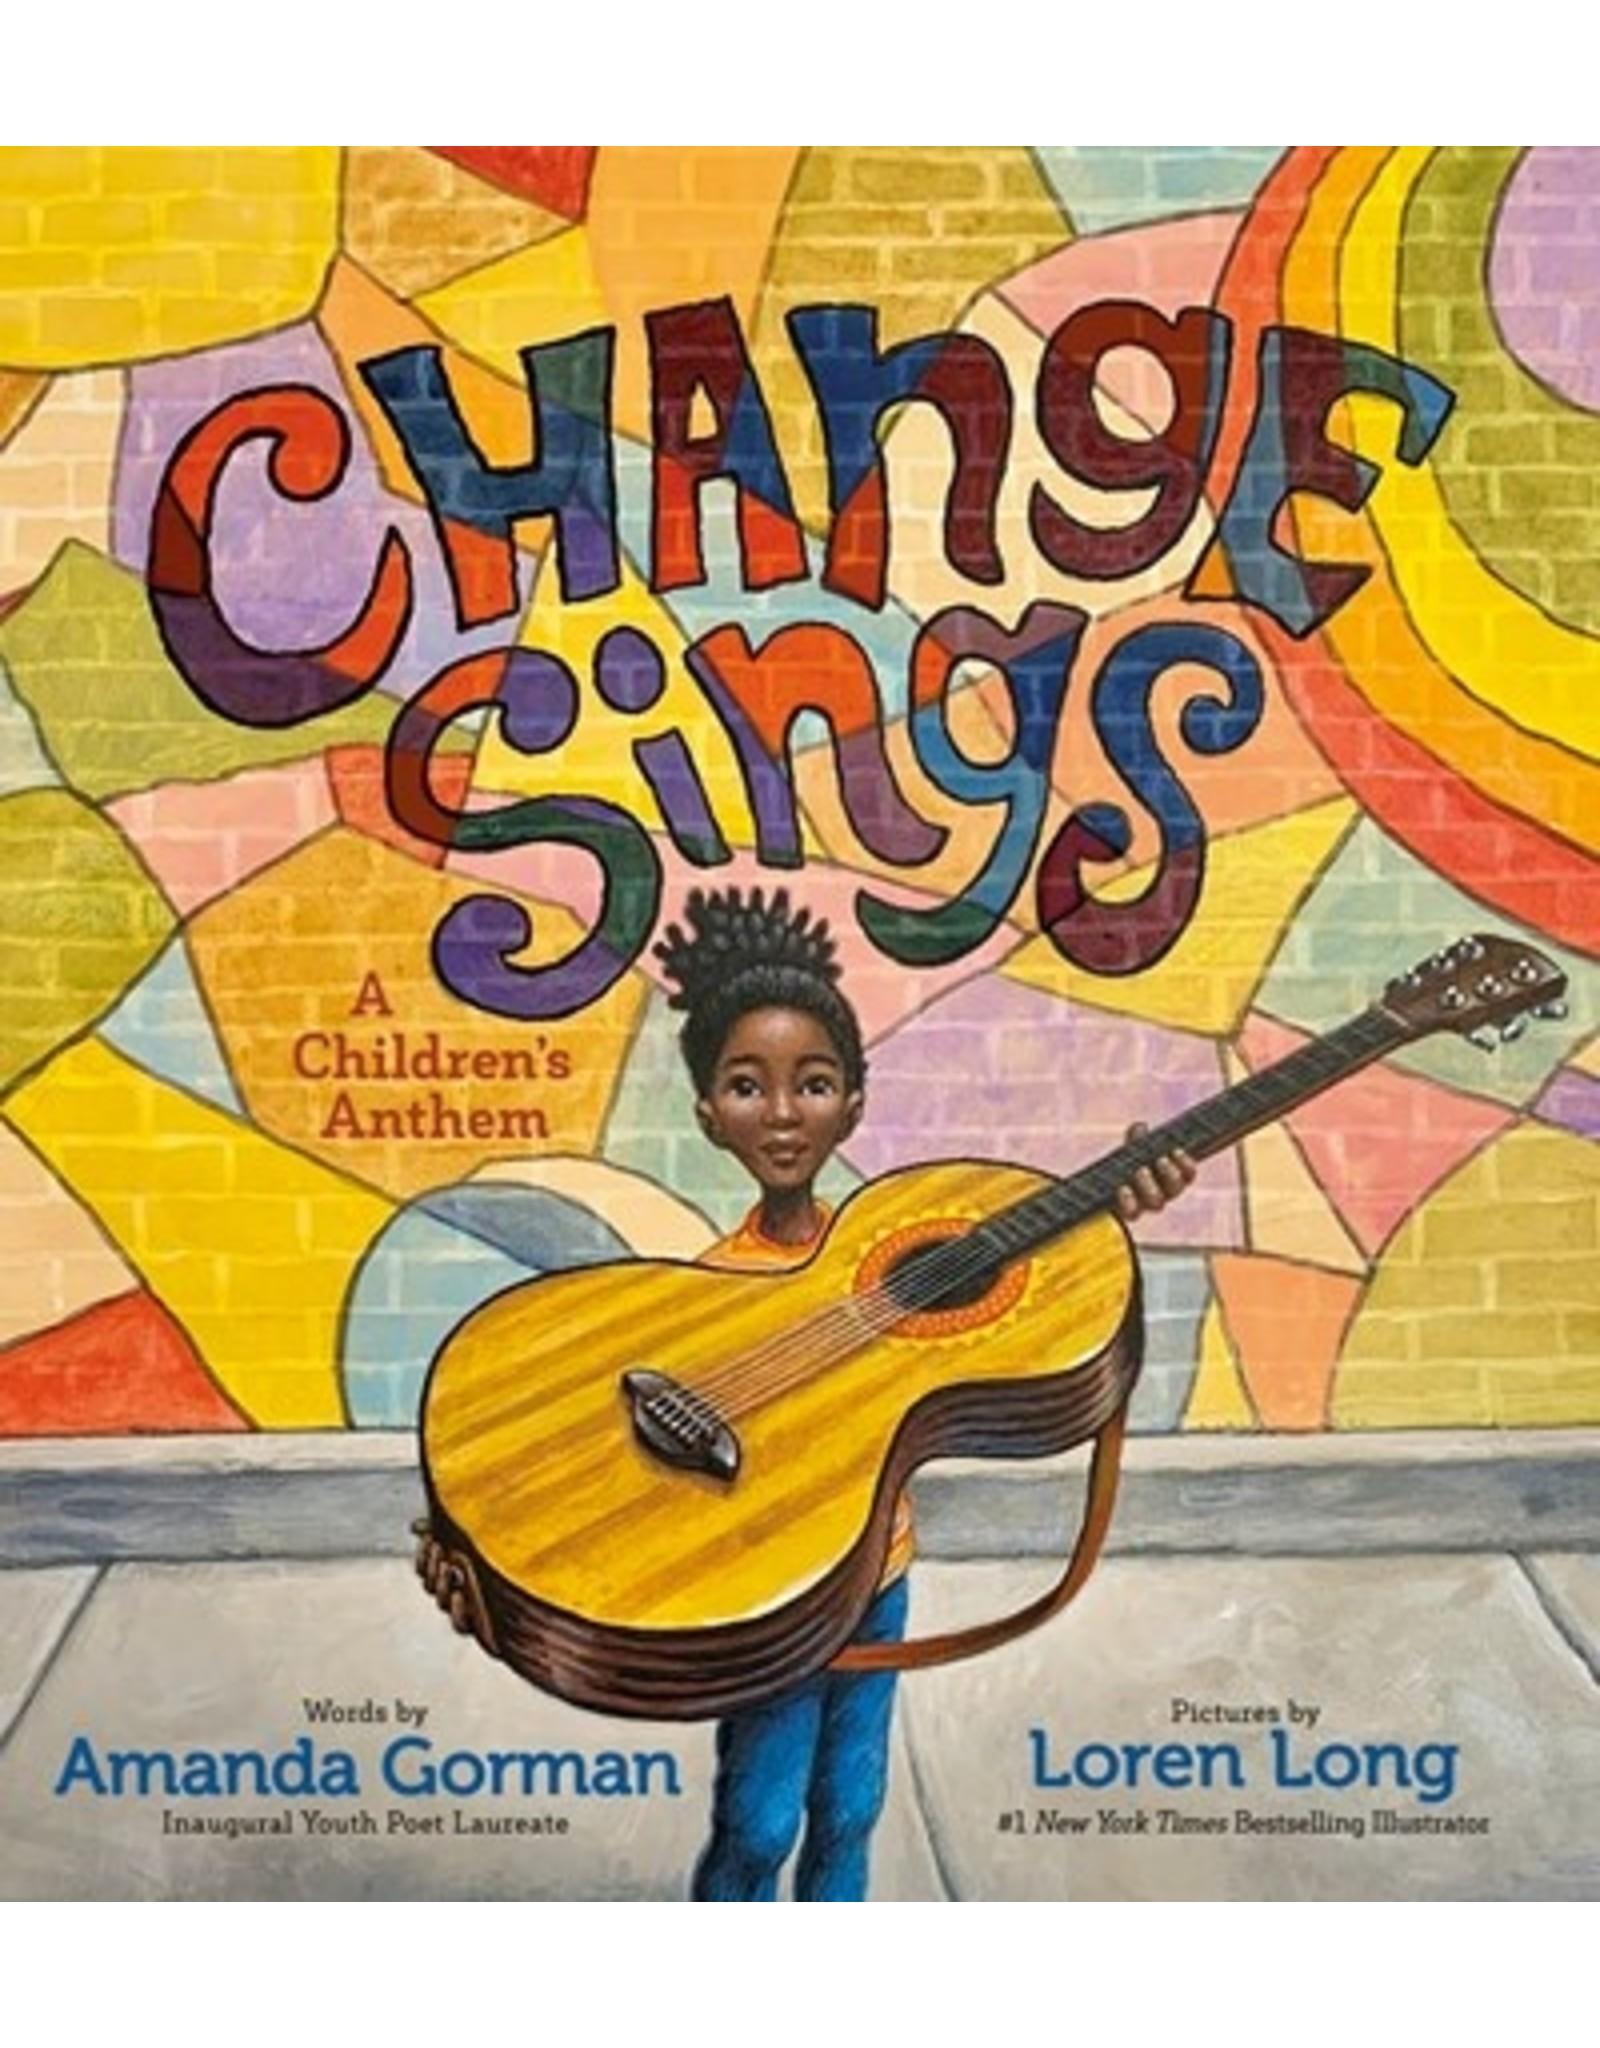 Books Change Sings : A Children's Anthem  Amanda Gorman, Illustrated by Loren Long